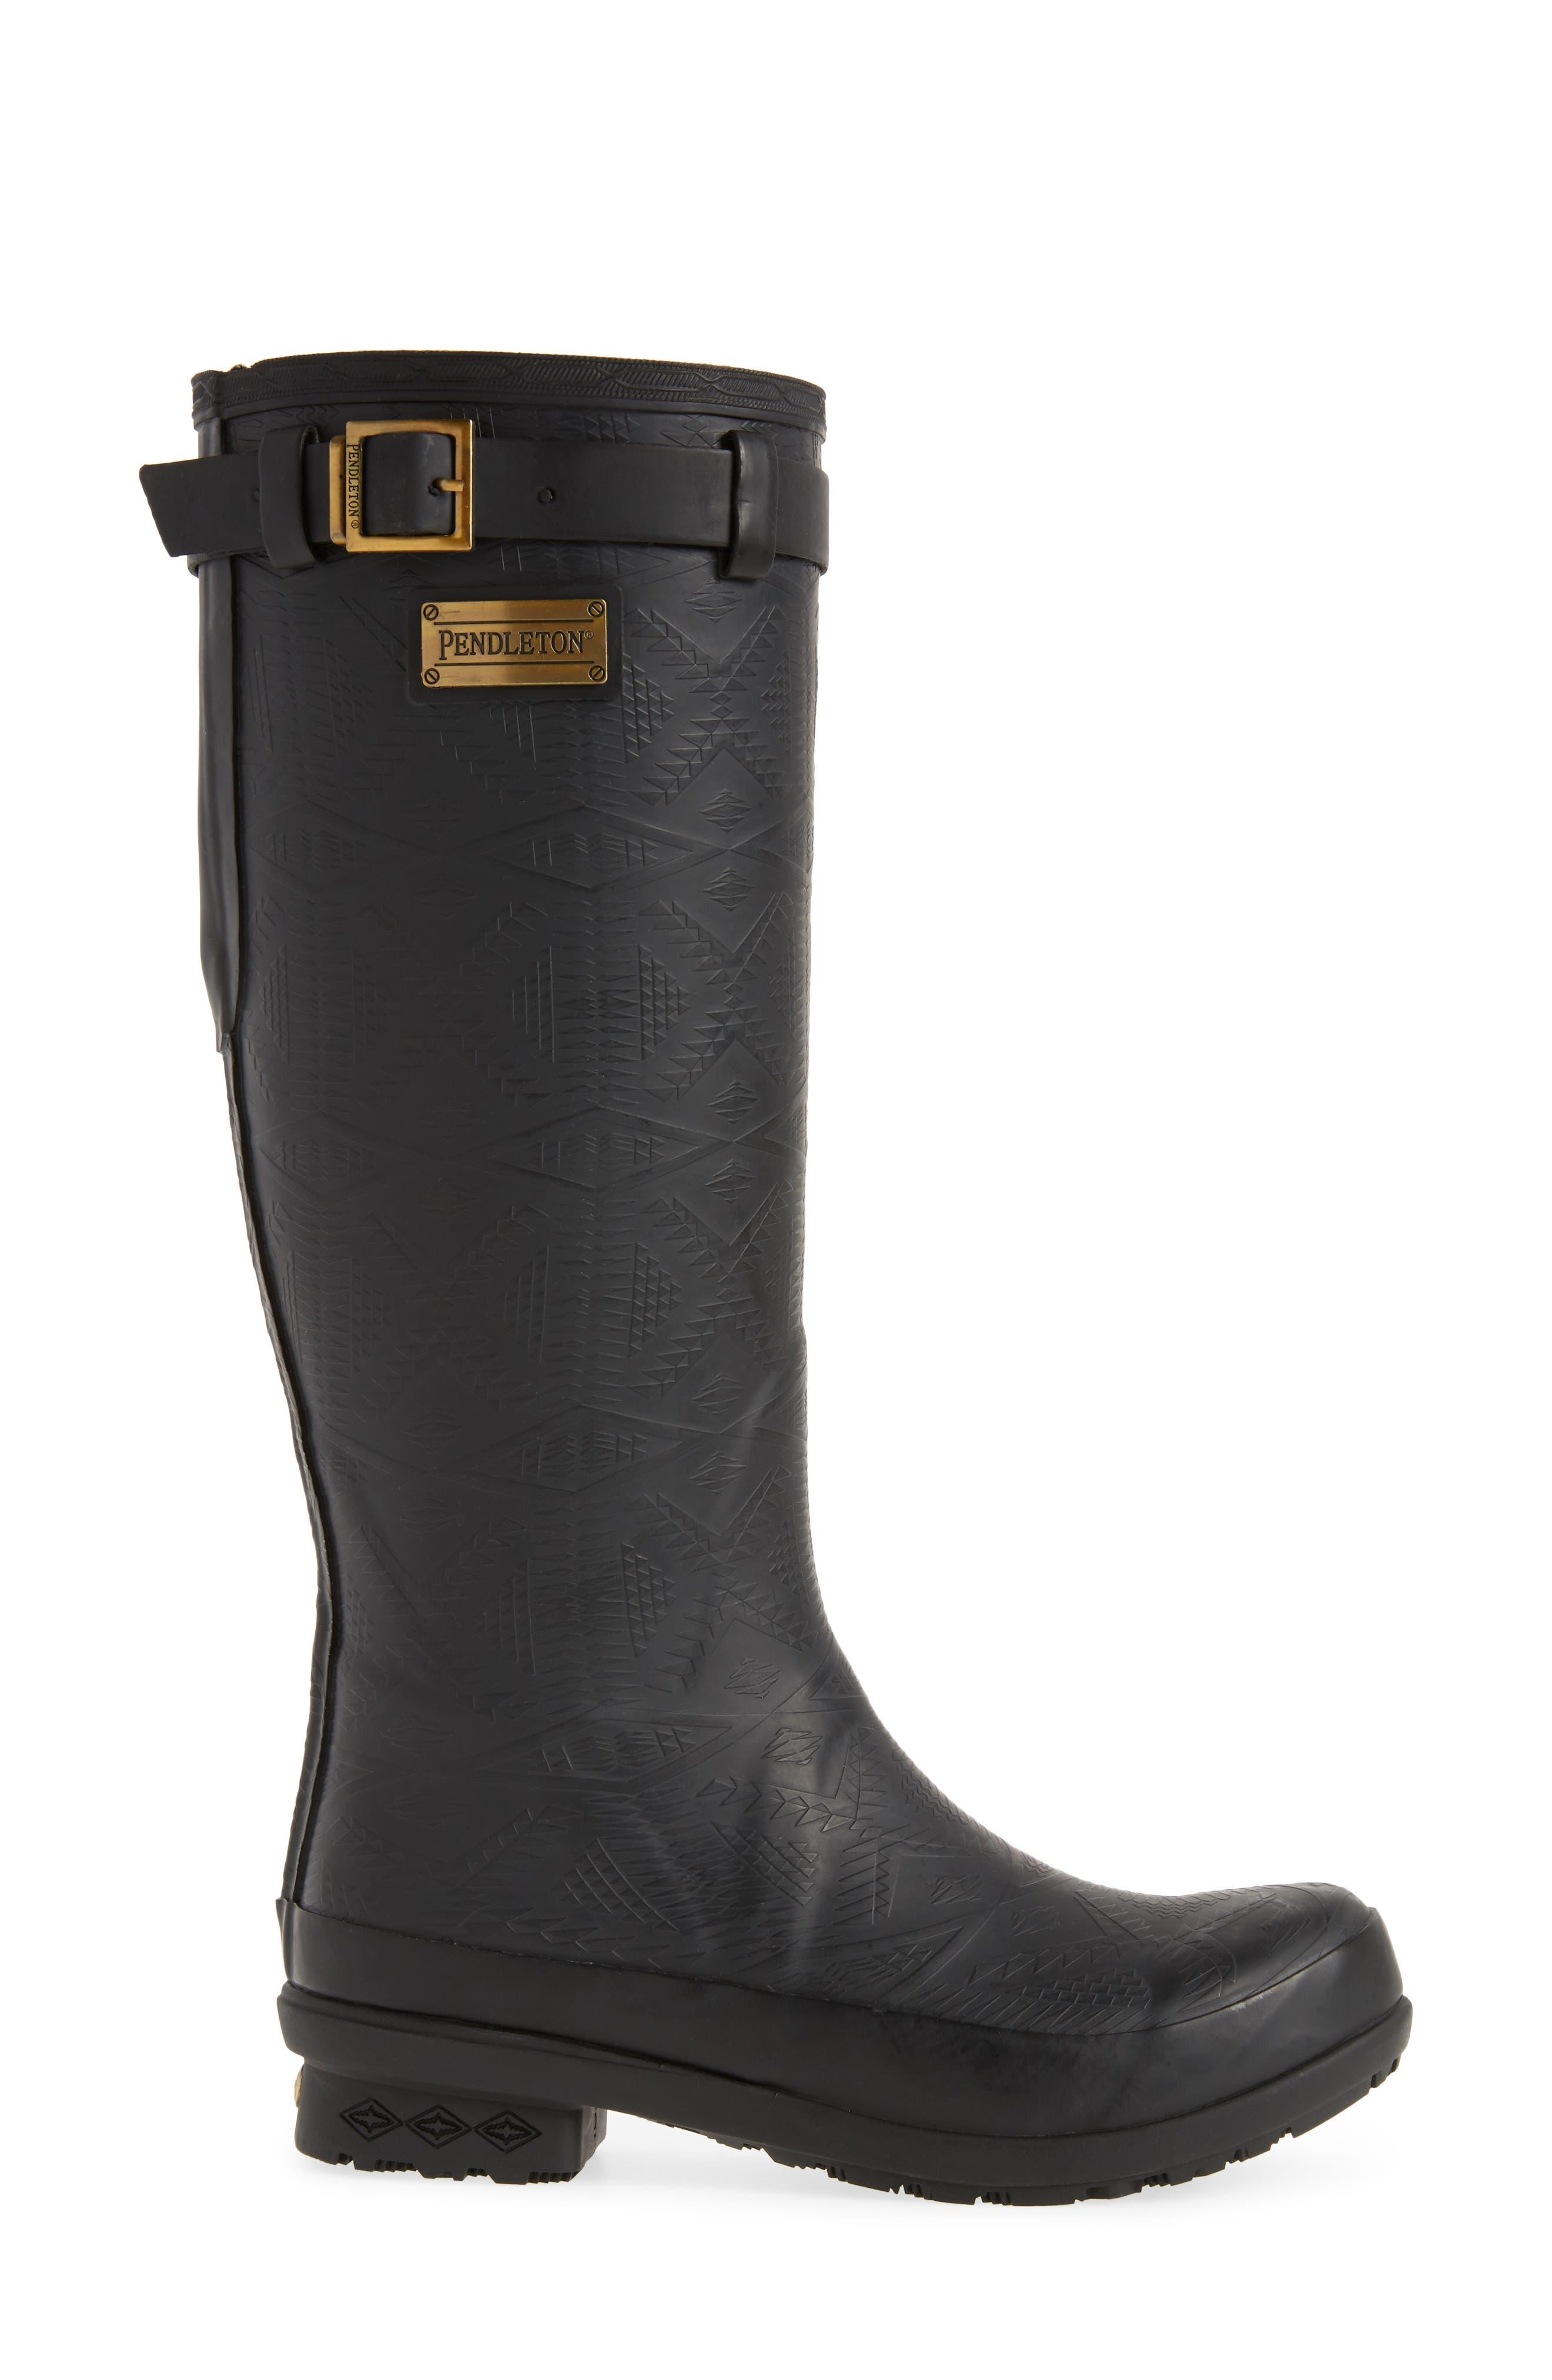 PENDLETON, Embossed Tall Waterproof Rain Boot, Alternate thumbnail 3, color, BLACK